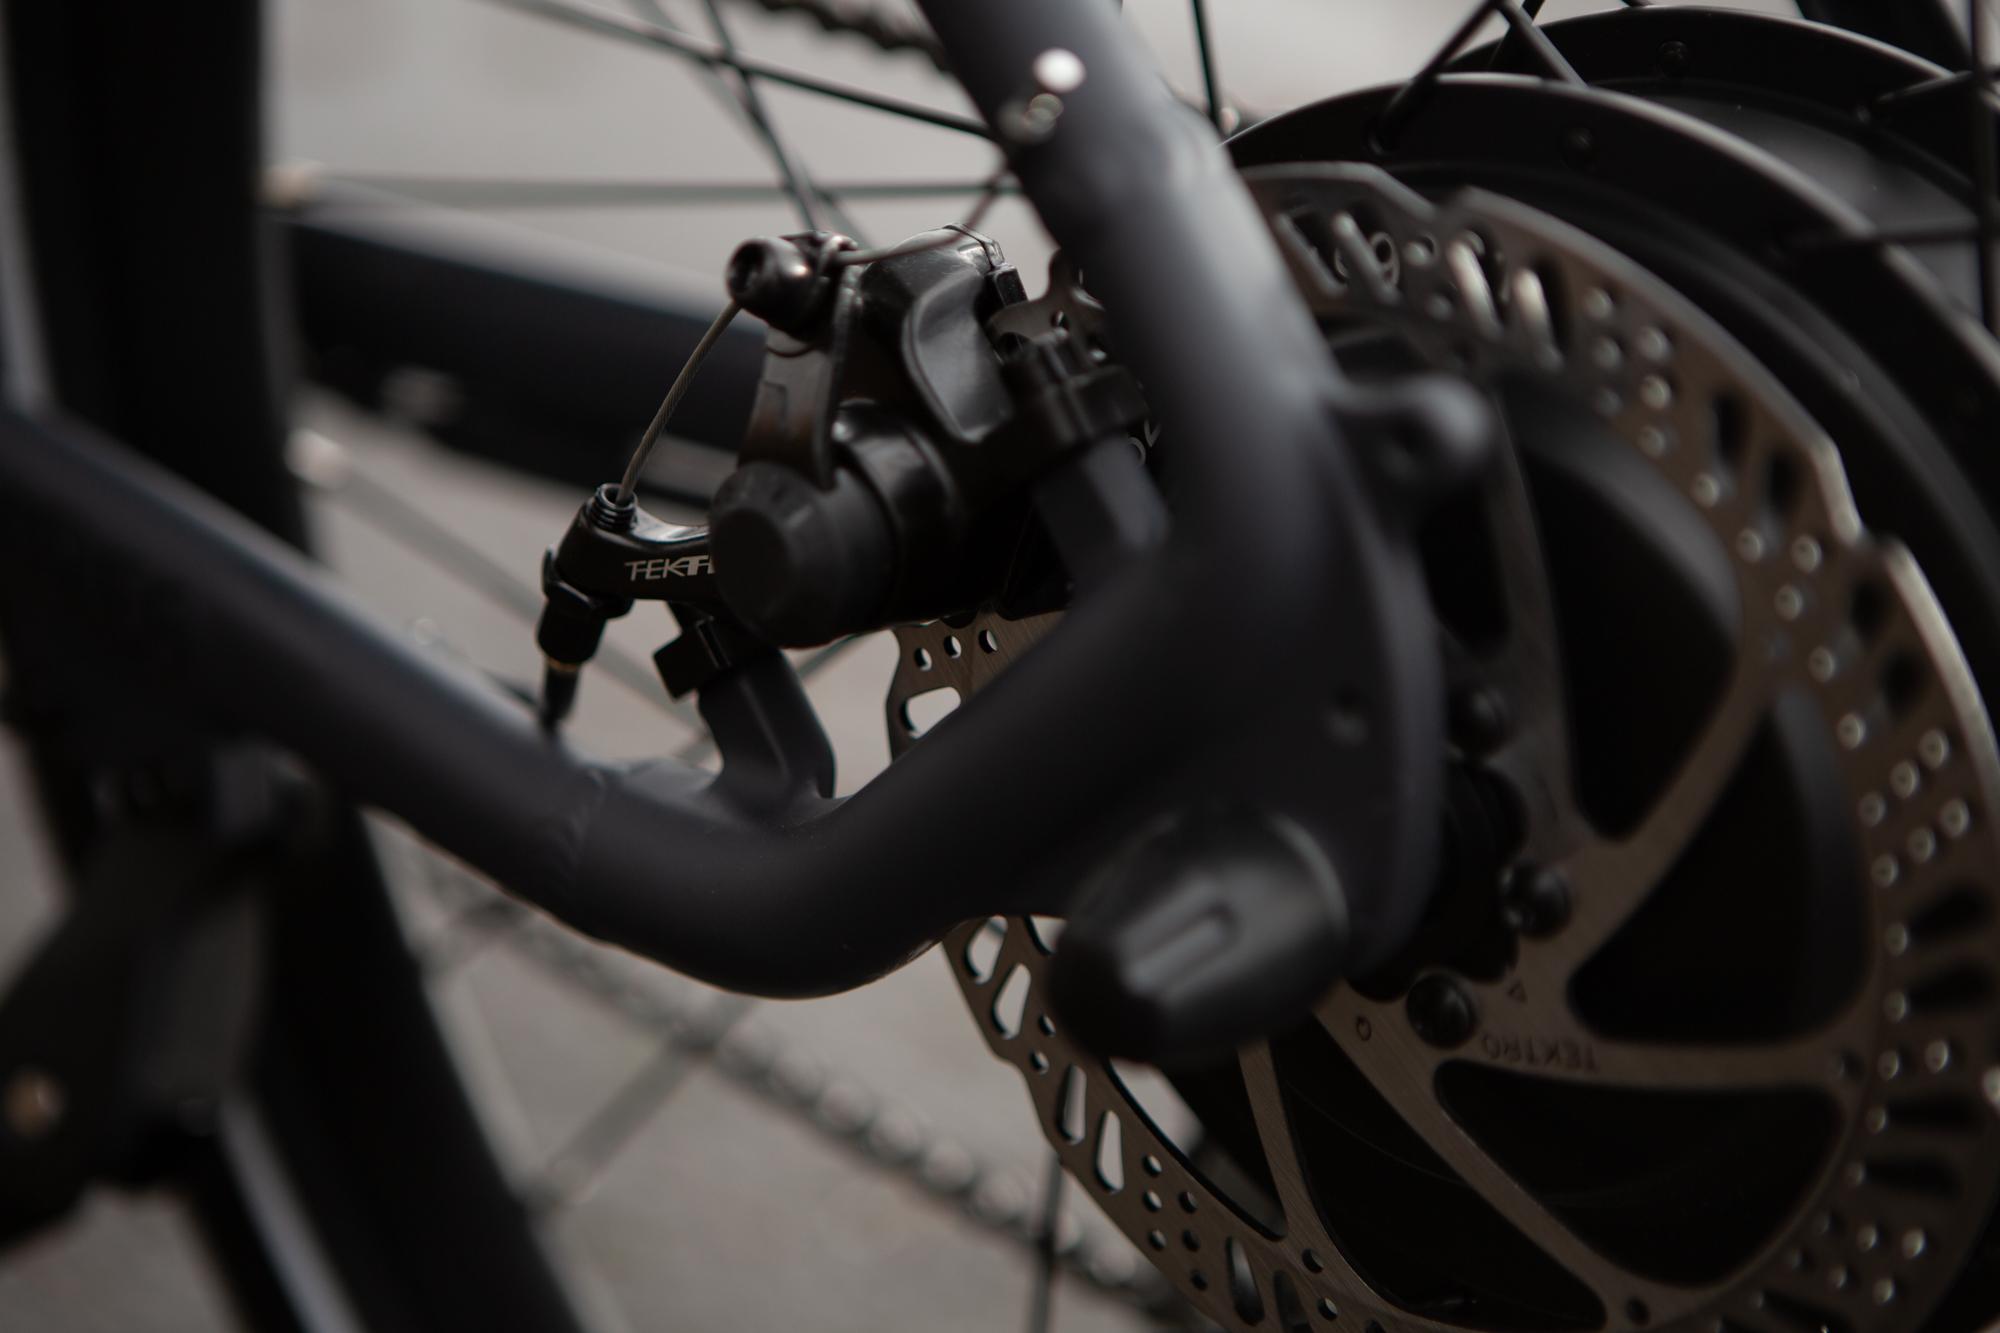 Ride1Up core 5 Tektro 160mm rear brake